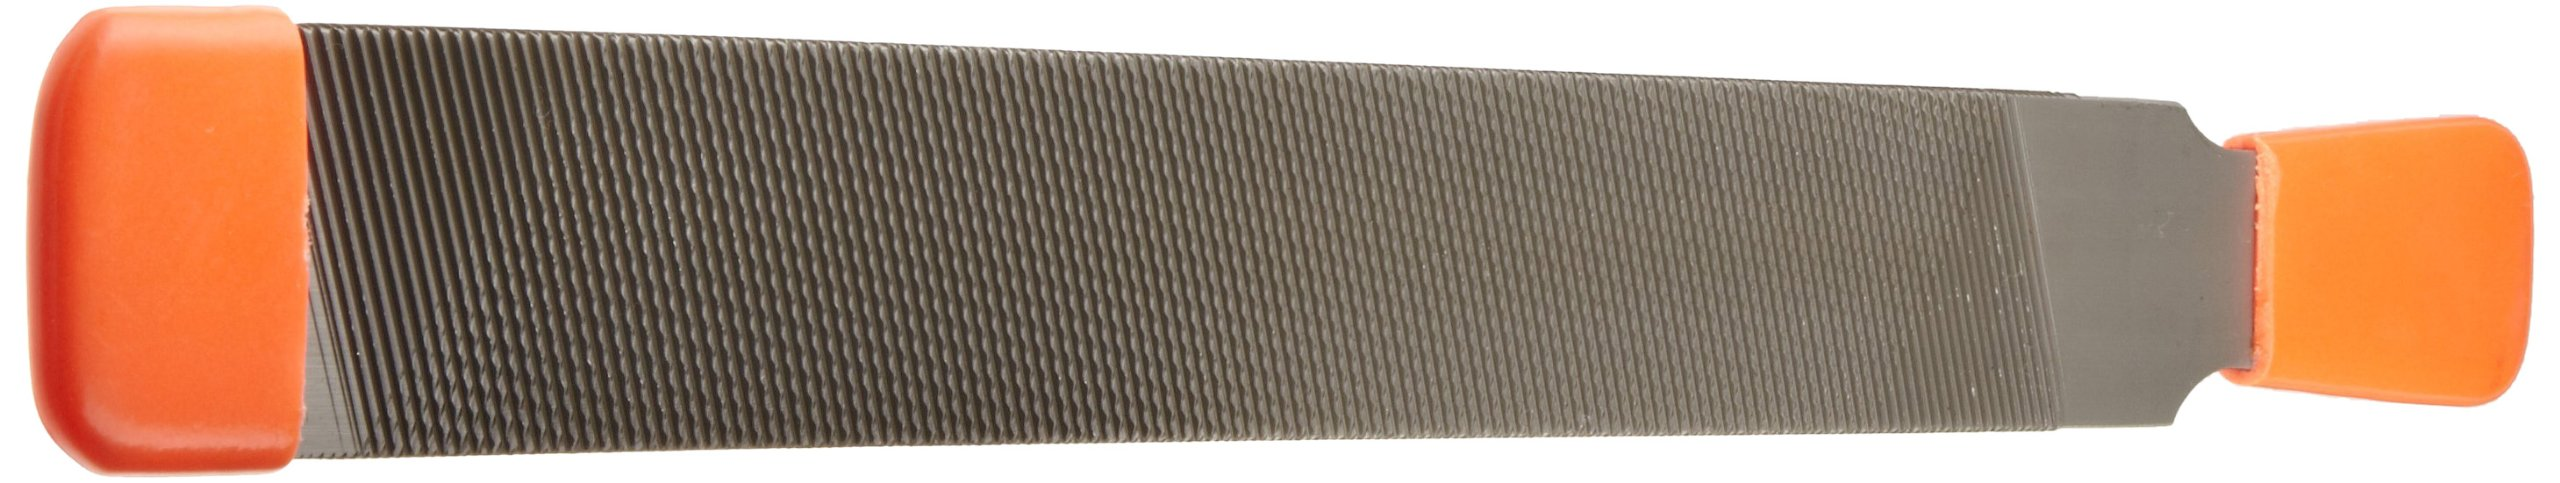 Nicholson Farrier Rasp File, American Pattern, Rasp Cut, Rectangular, 14'' Length